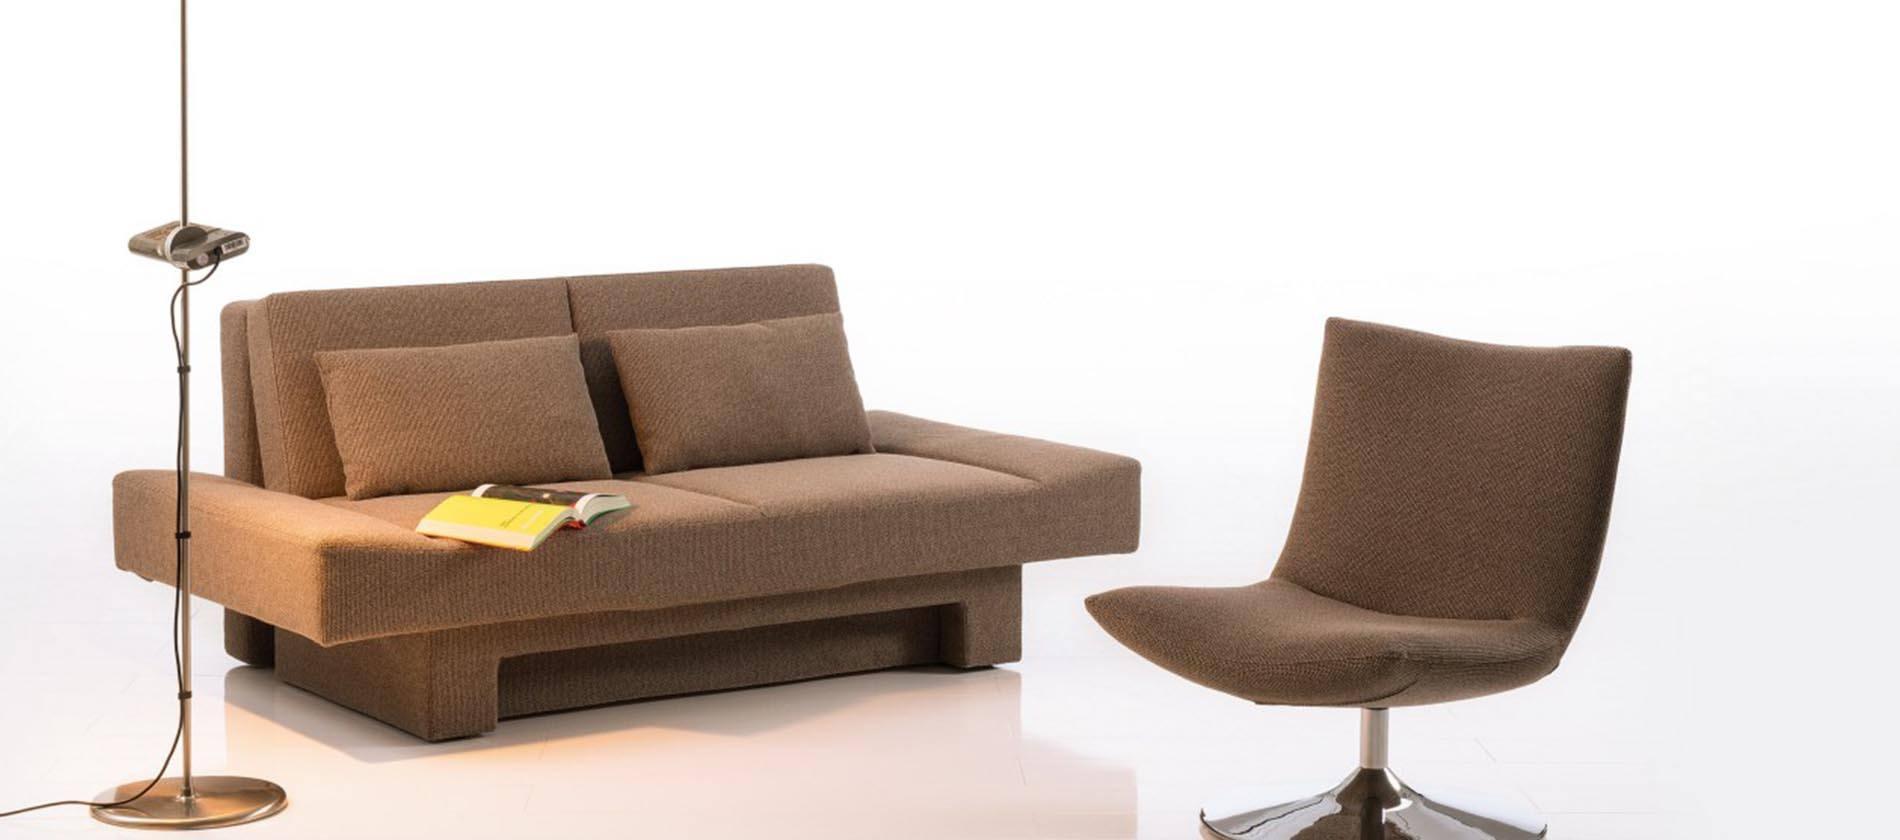 klappsofa mit bettkasten fabulous garten ideen avec schlafsofa sitzer bettkasten die besten. Black Bedroom Furniture Sets. Home Design Ideas